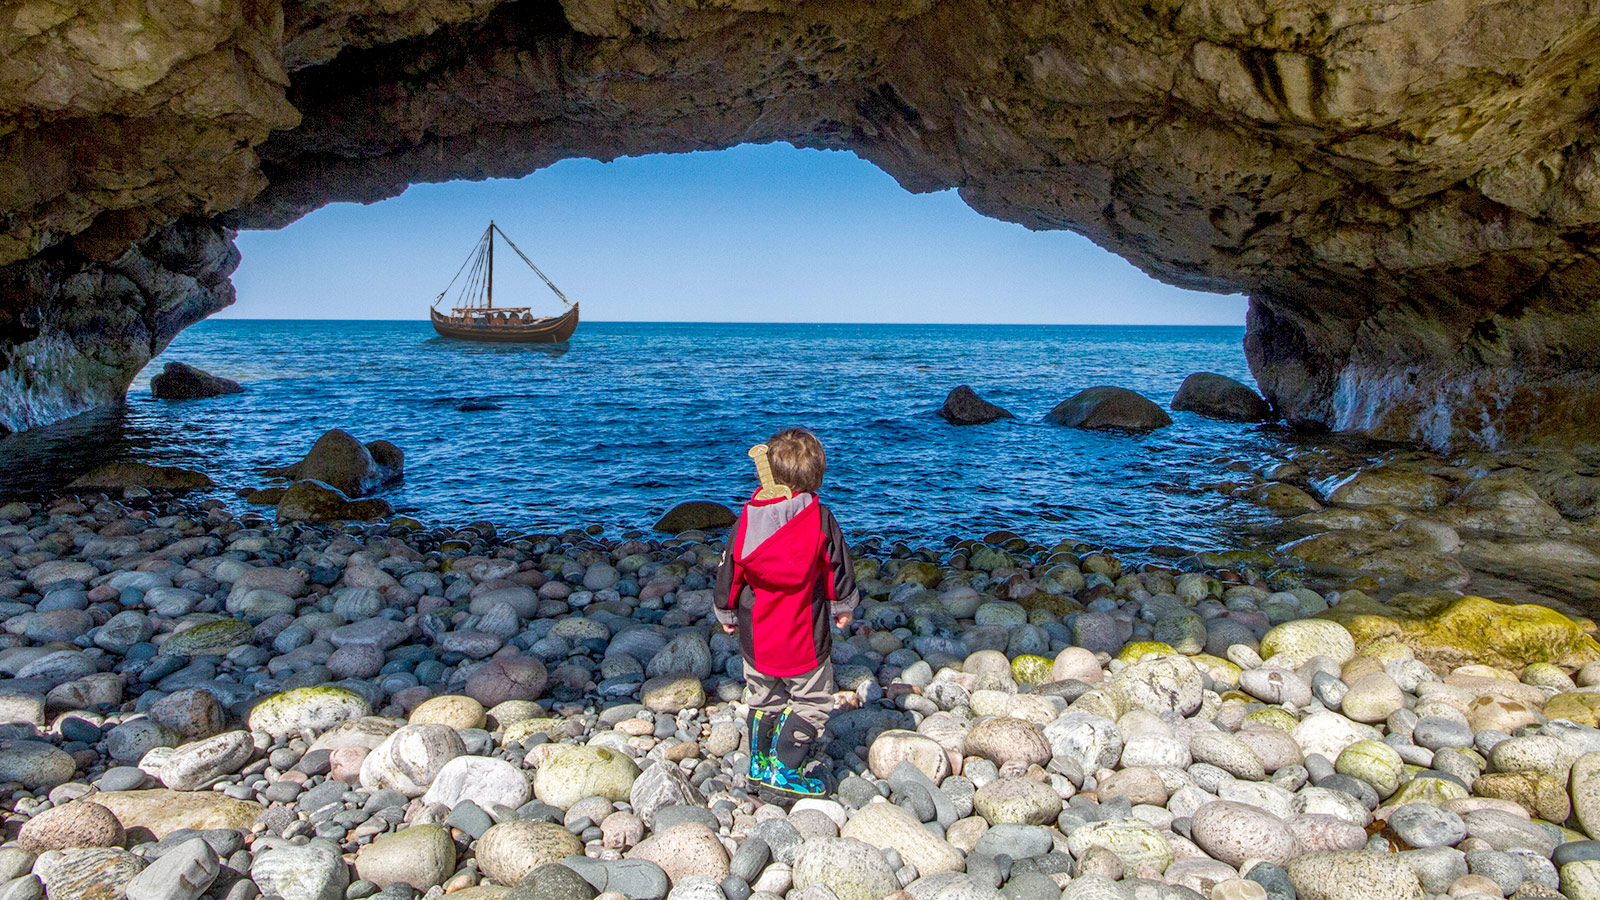 Chasing History On The Newfoundland Viking Trail